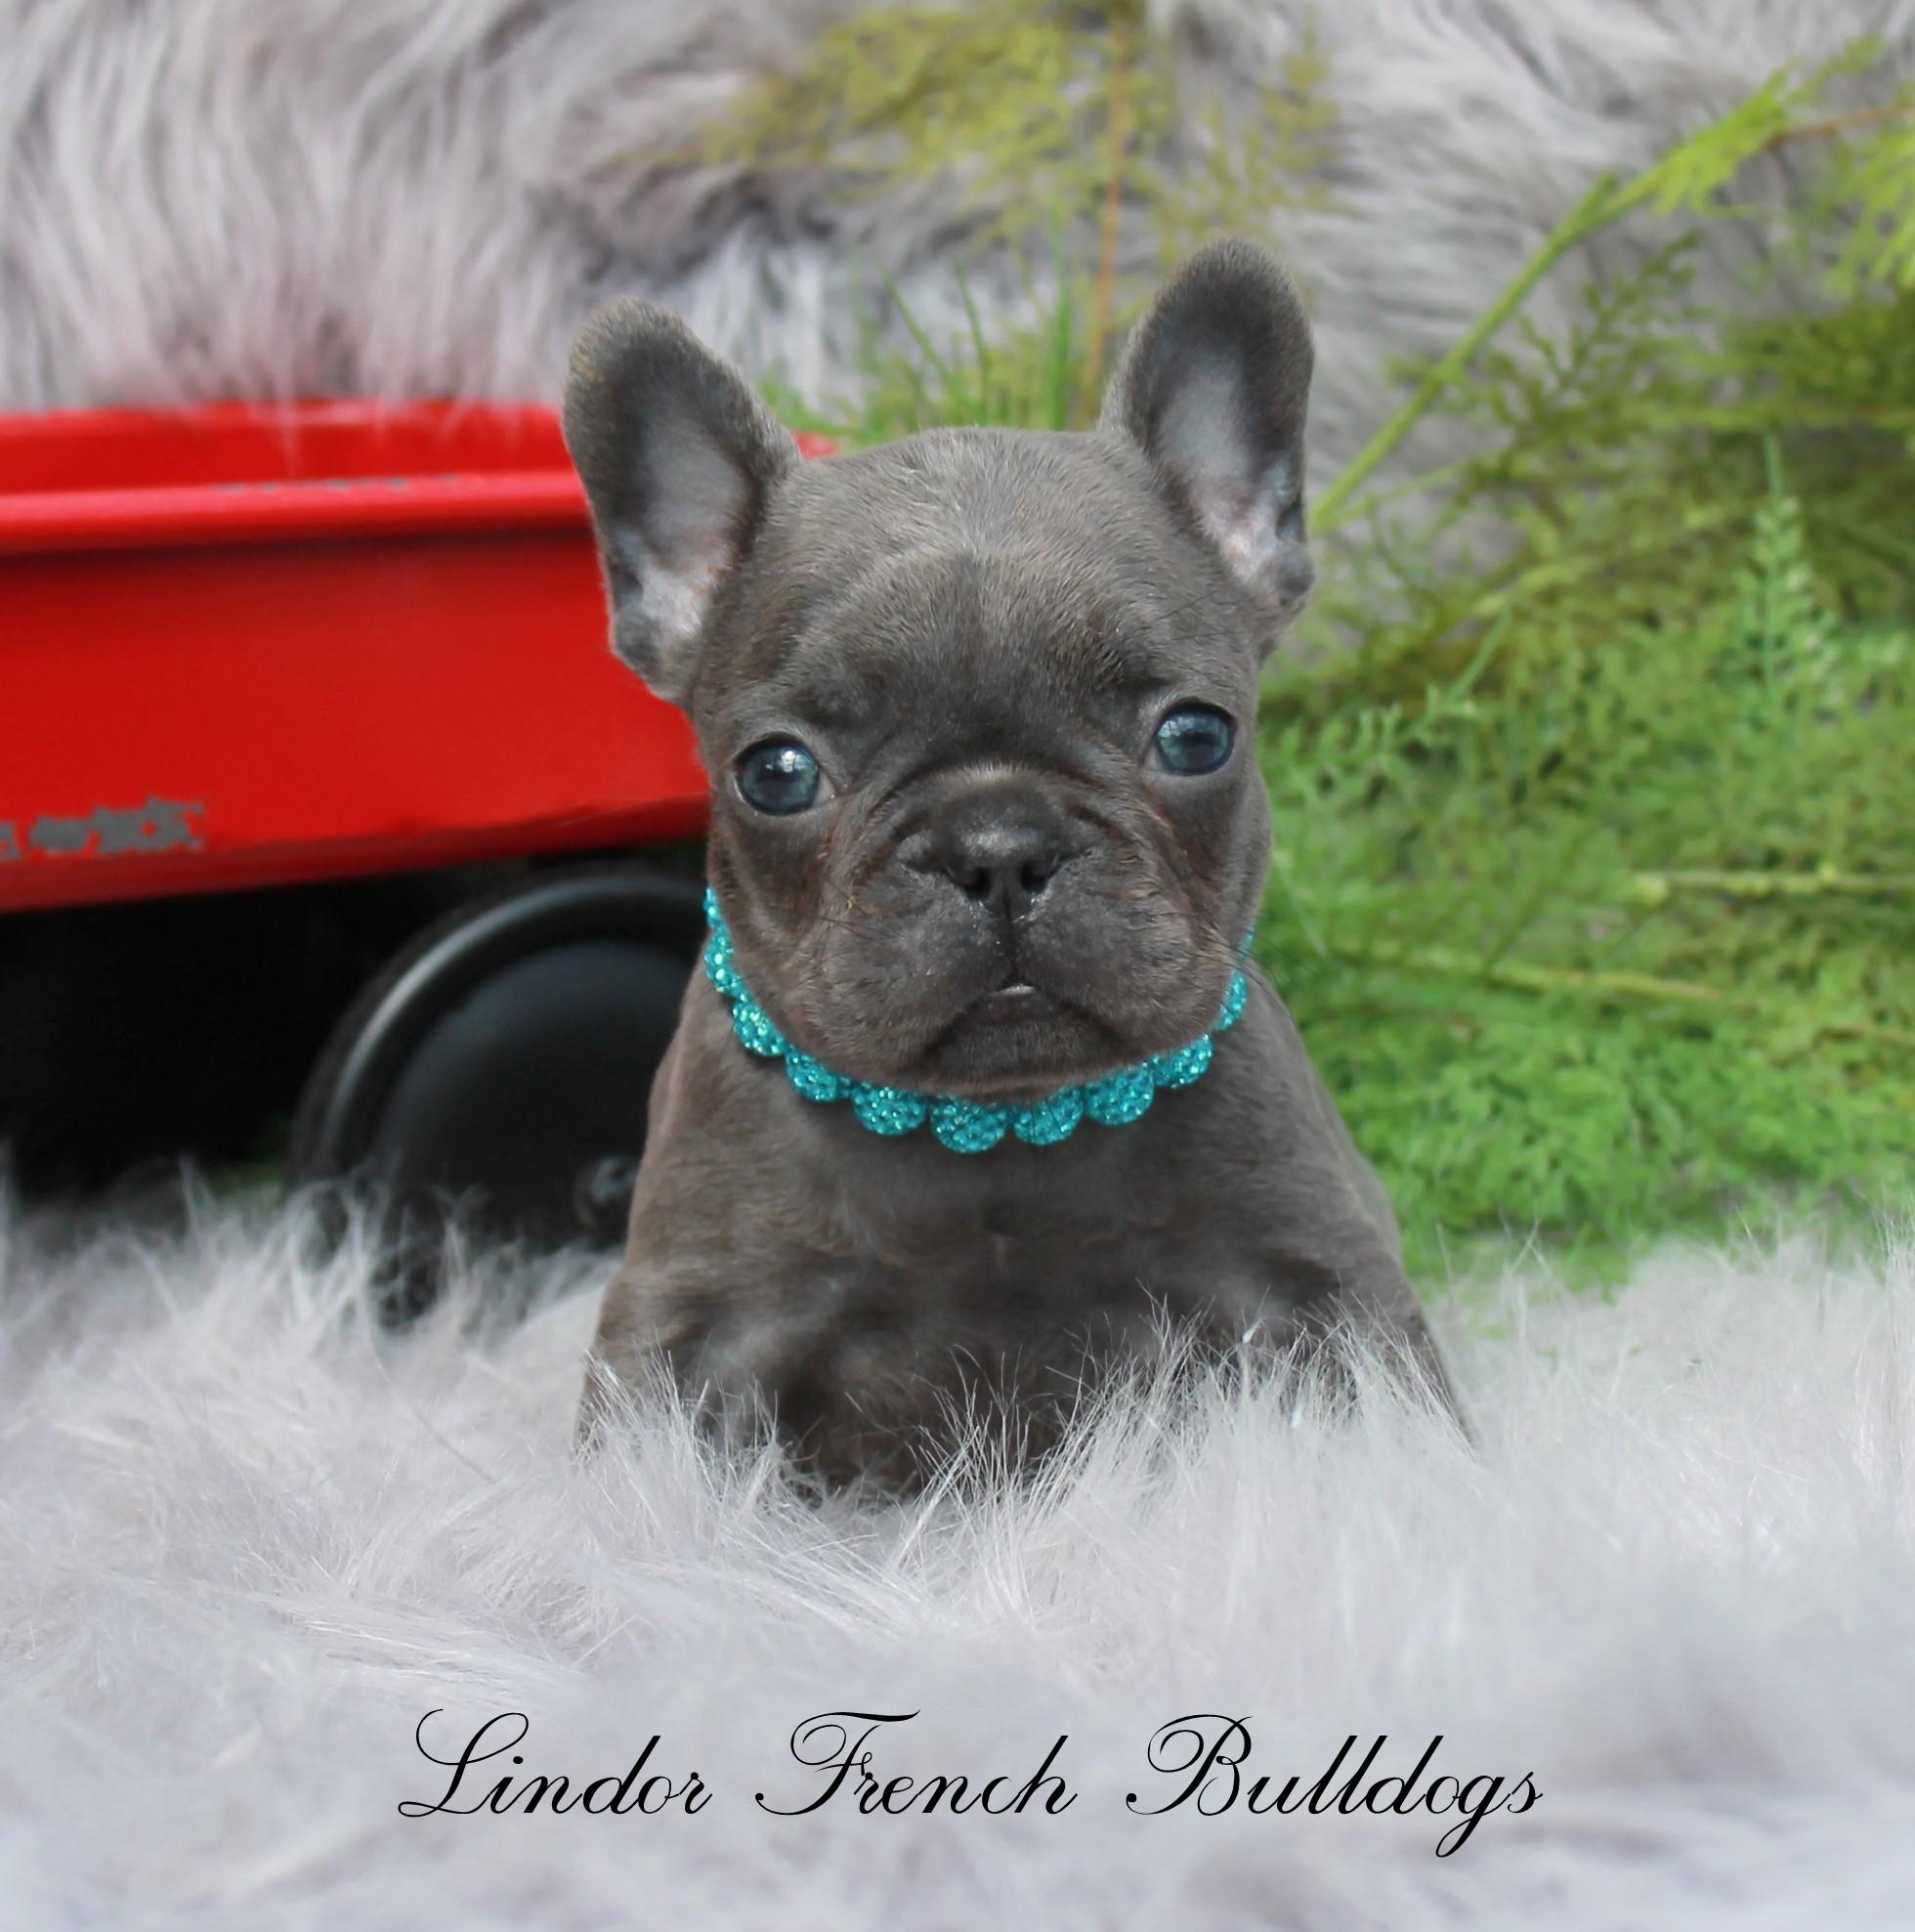 solid blue french bulldog puppy sitting on a fuzzy rug wearing a blue collar